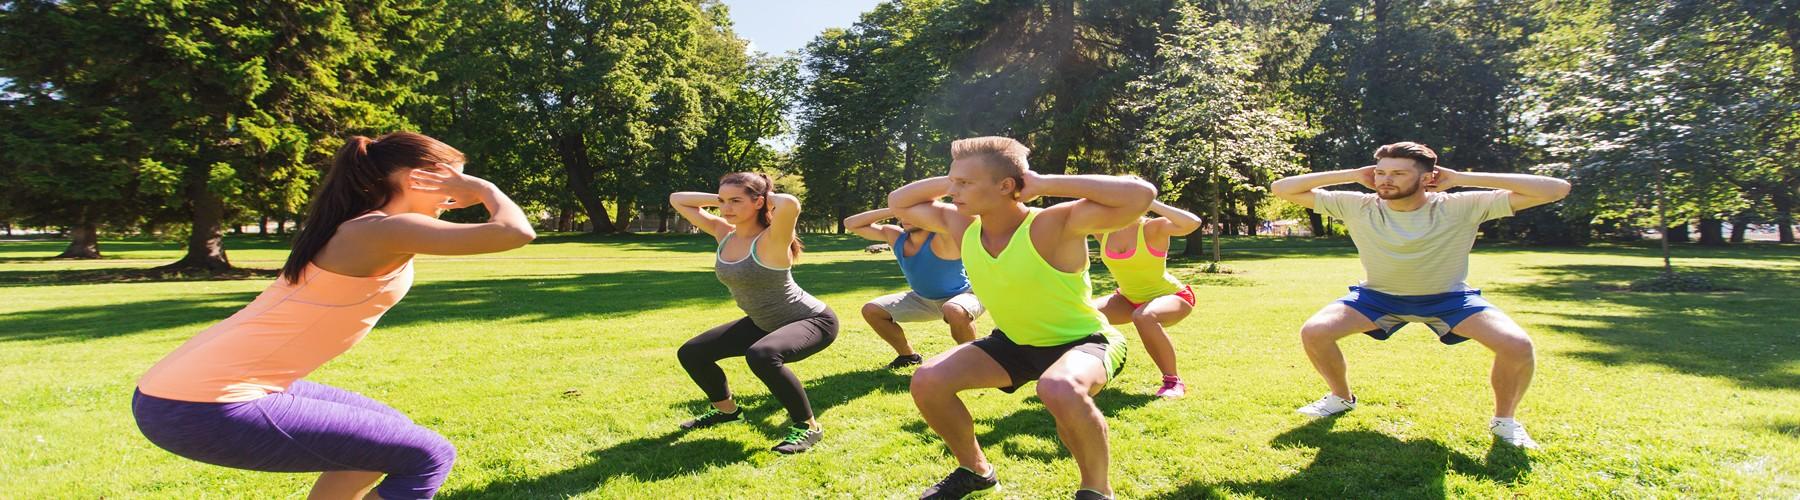 Boot Camp Classes  Fitness Gym Near Me  Bryan Glazer -9276